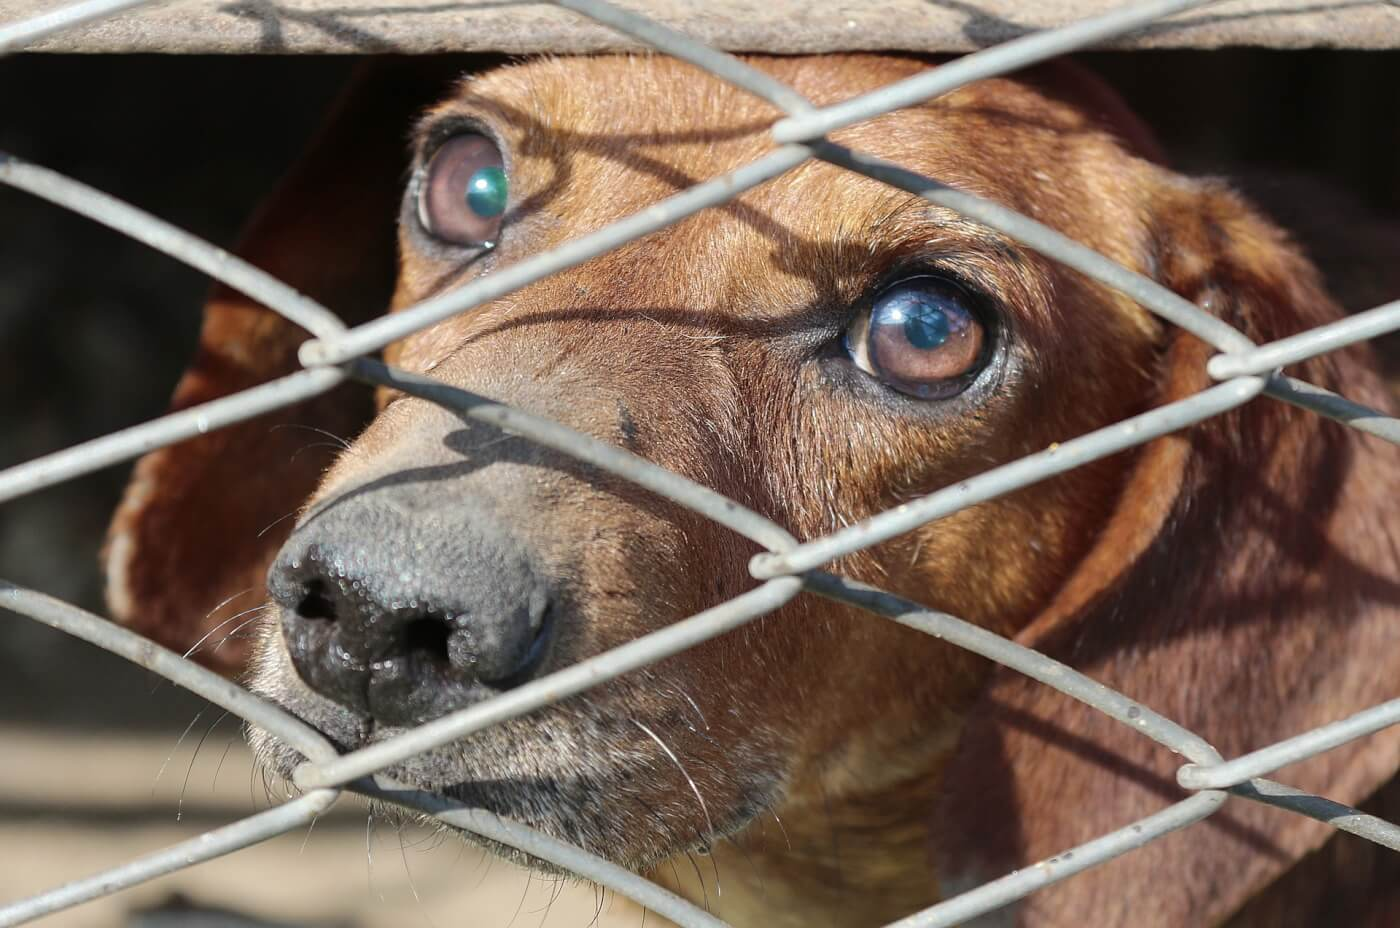 Urgent: Help Strengthen Prevention of Cruelty to Animals Act